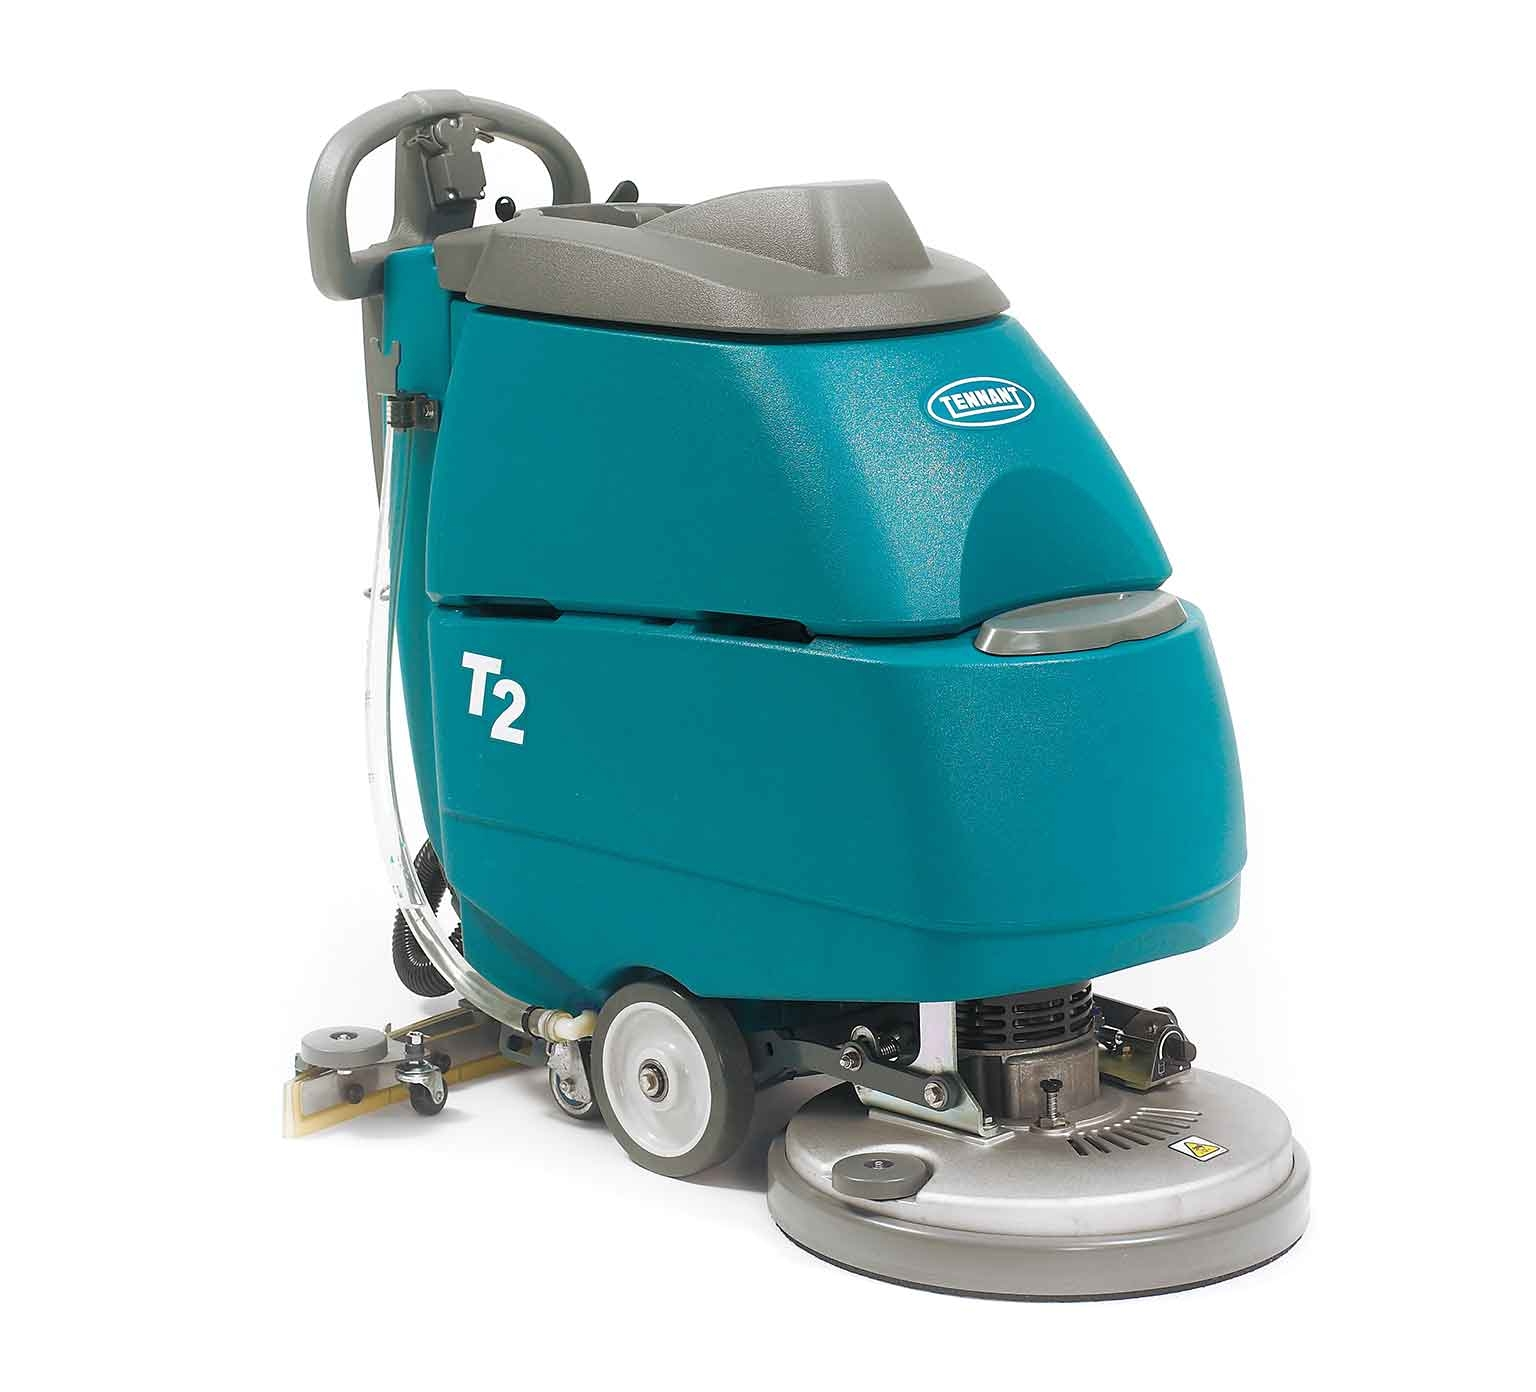 t2 walk behind compact scrubber alt